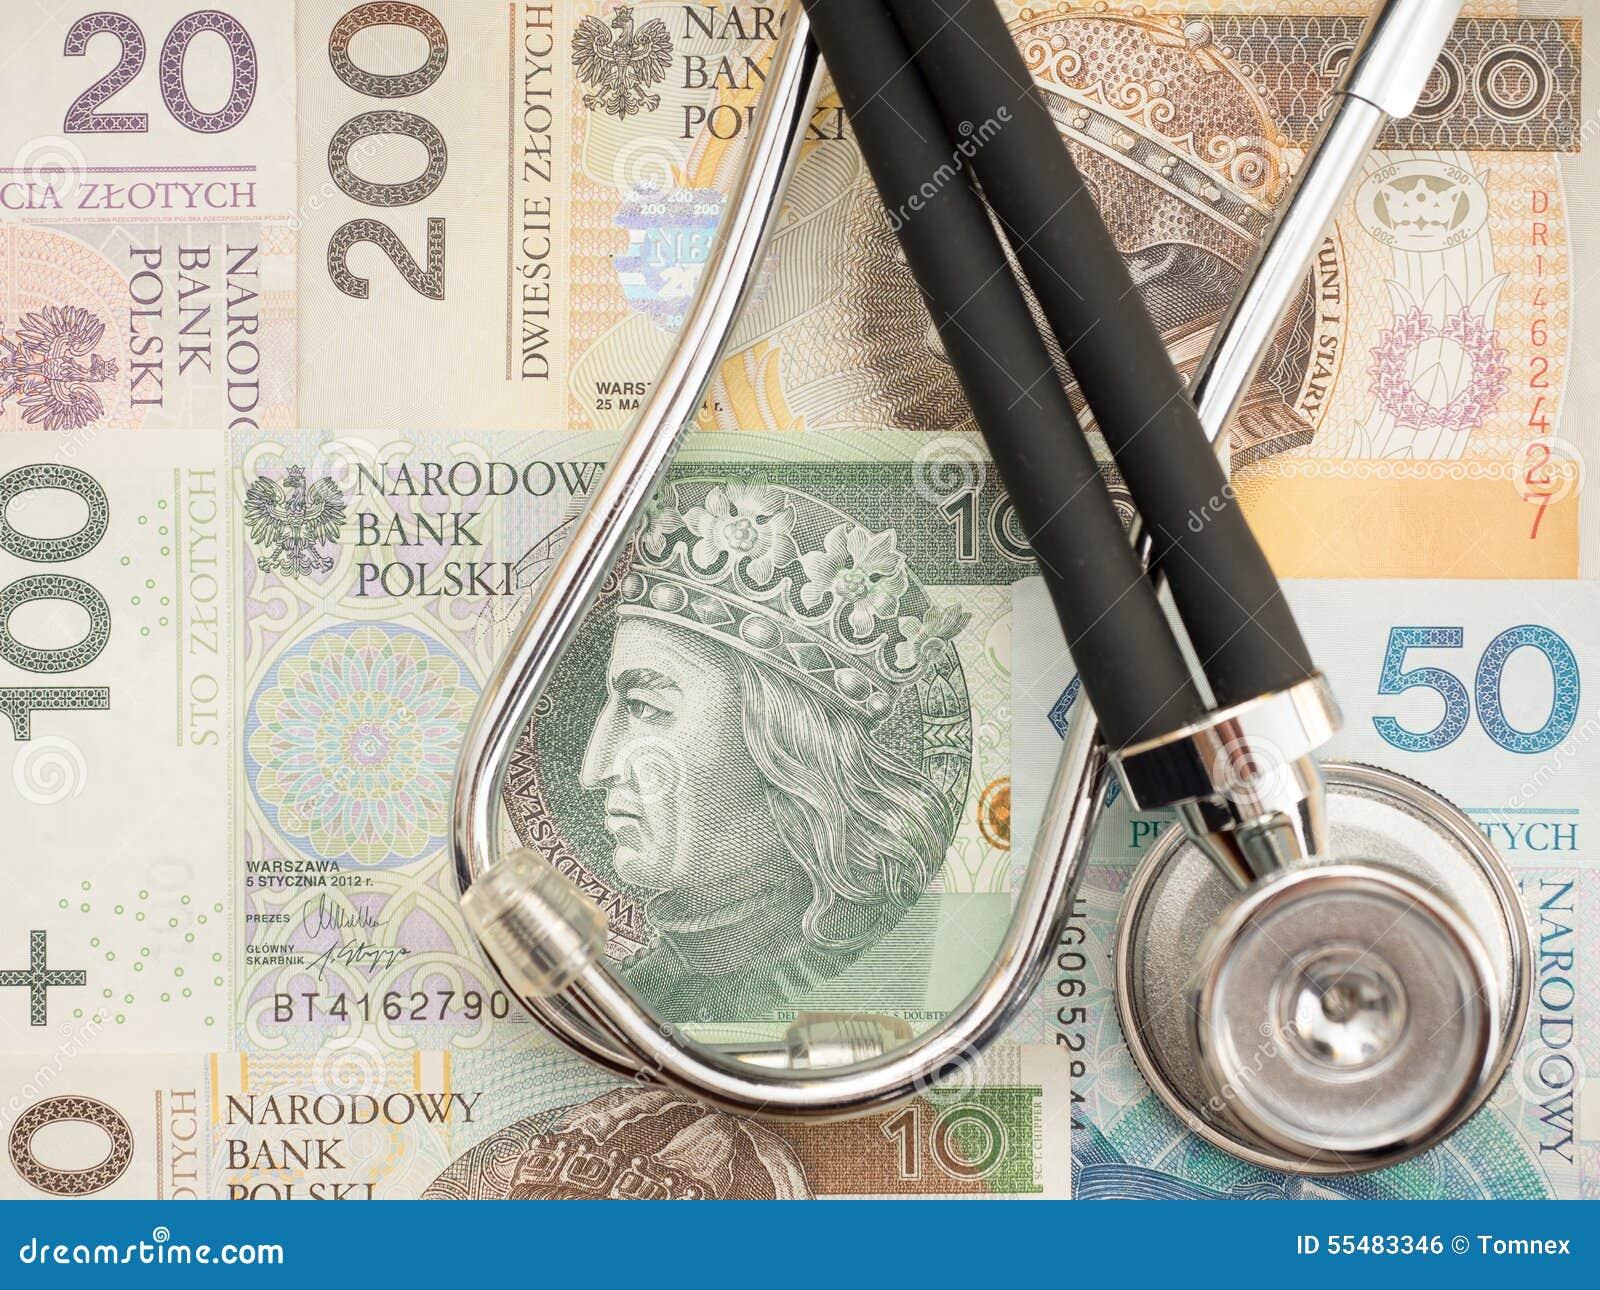 Poolse gezondheidszorgkosten